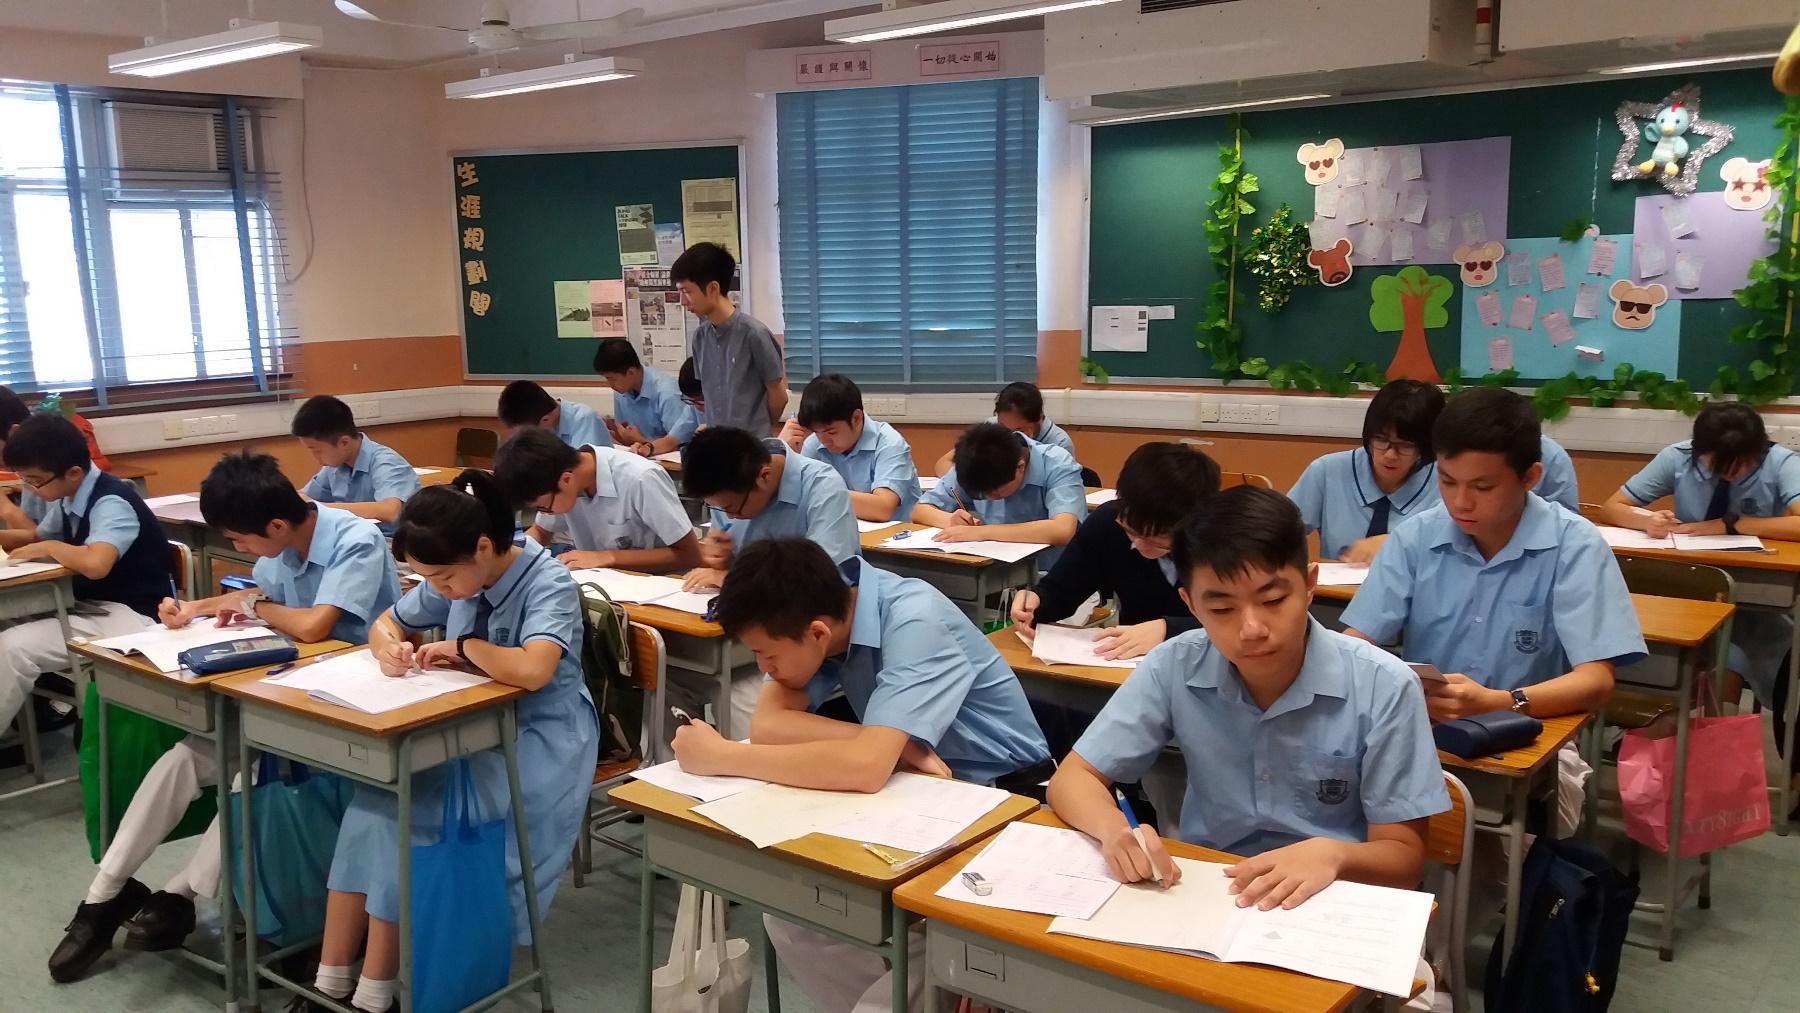 http://npc.edu.hk/sites/default/files/20181006_102033.jpg